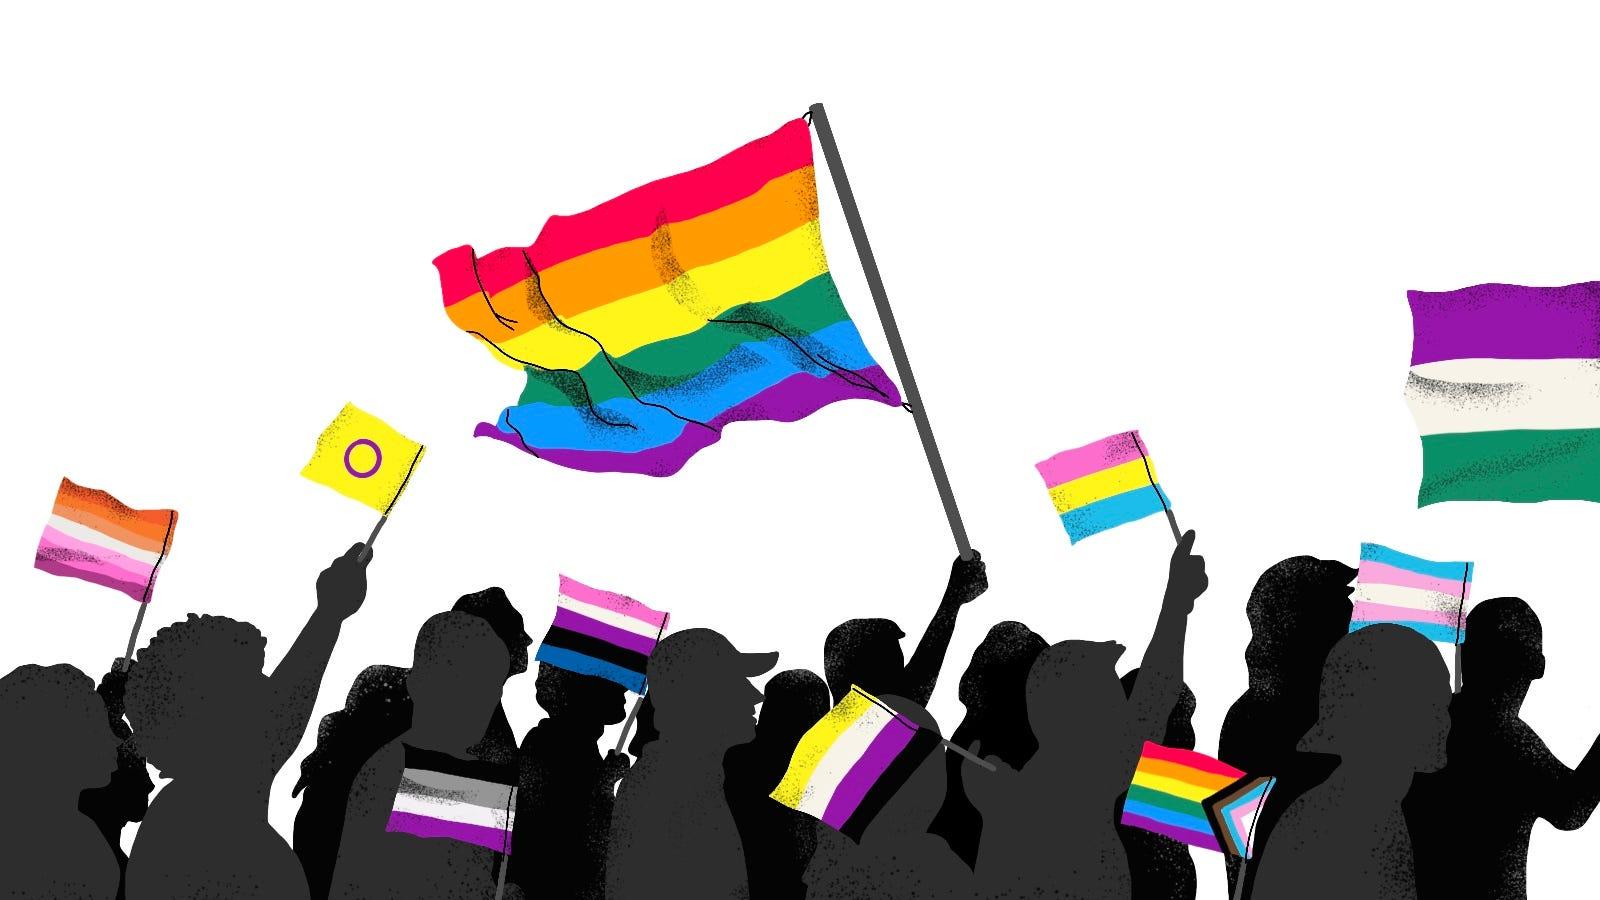 Sex Lesbian Bi Lgbt Flags Nonbinary Mens T-Shirt Gay Pride Trans